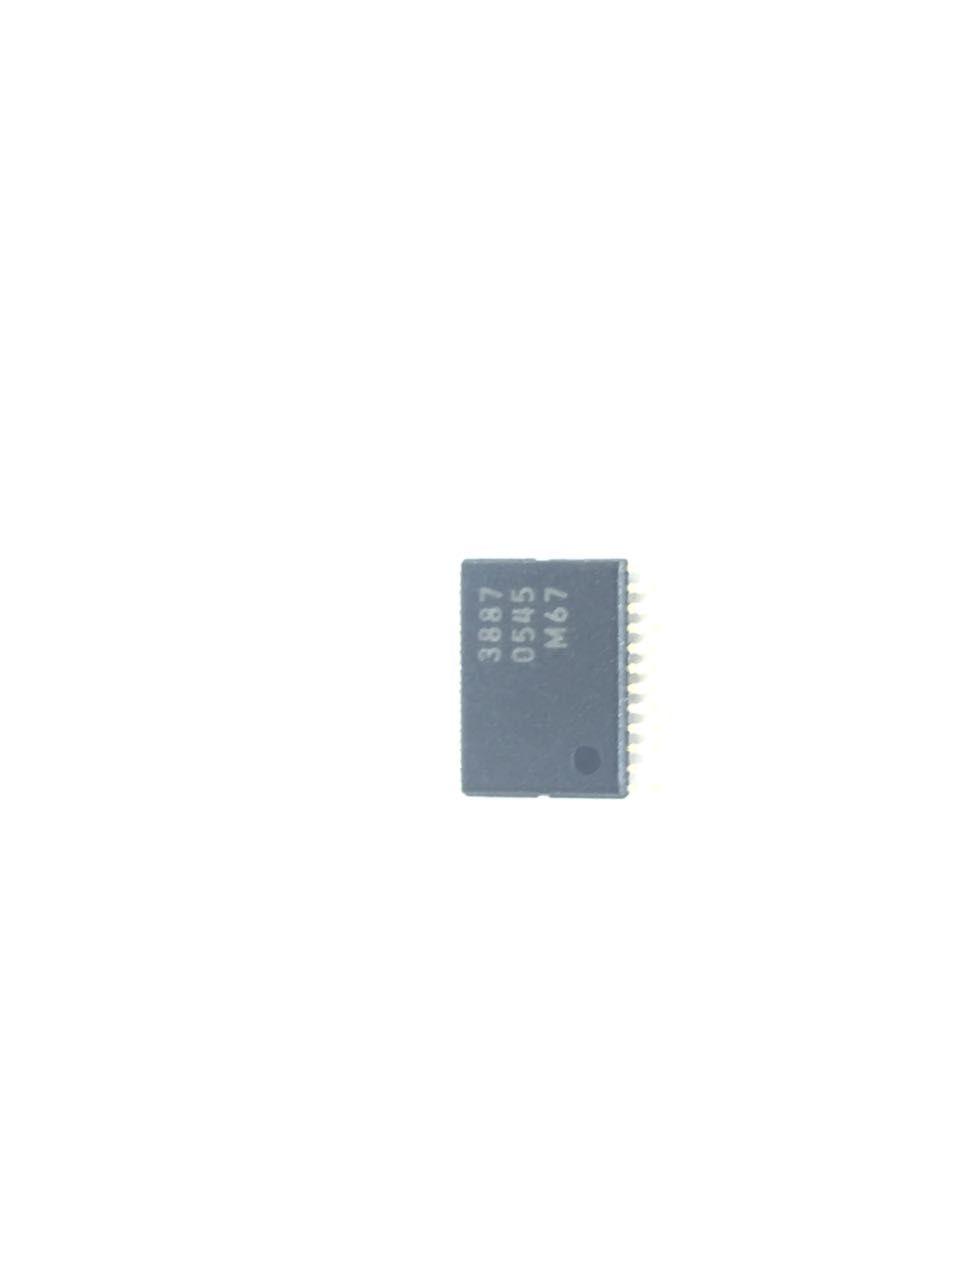 Ci Circuito Integrado MB3887 3887 PV Novo eletro Cypress